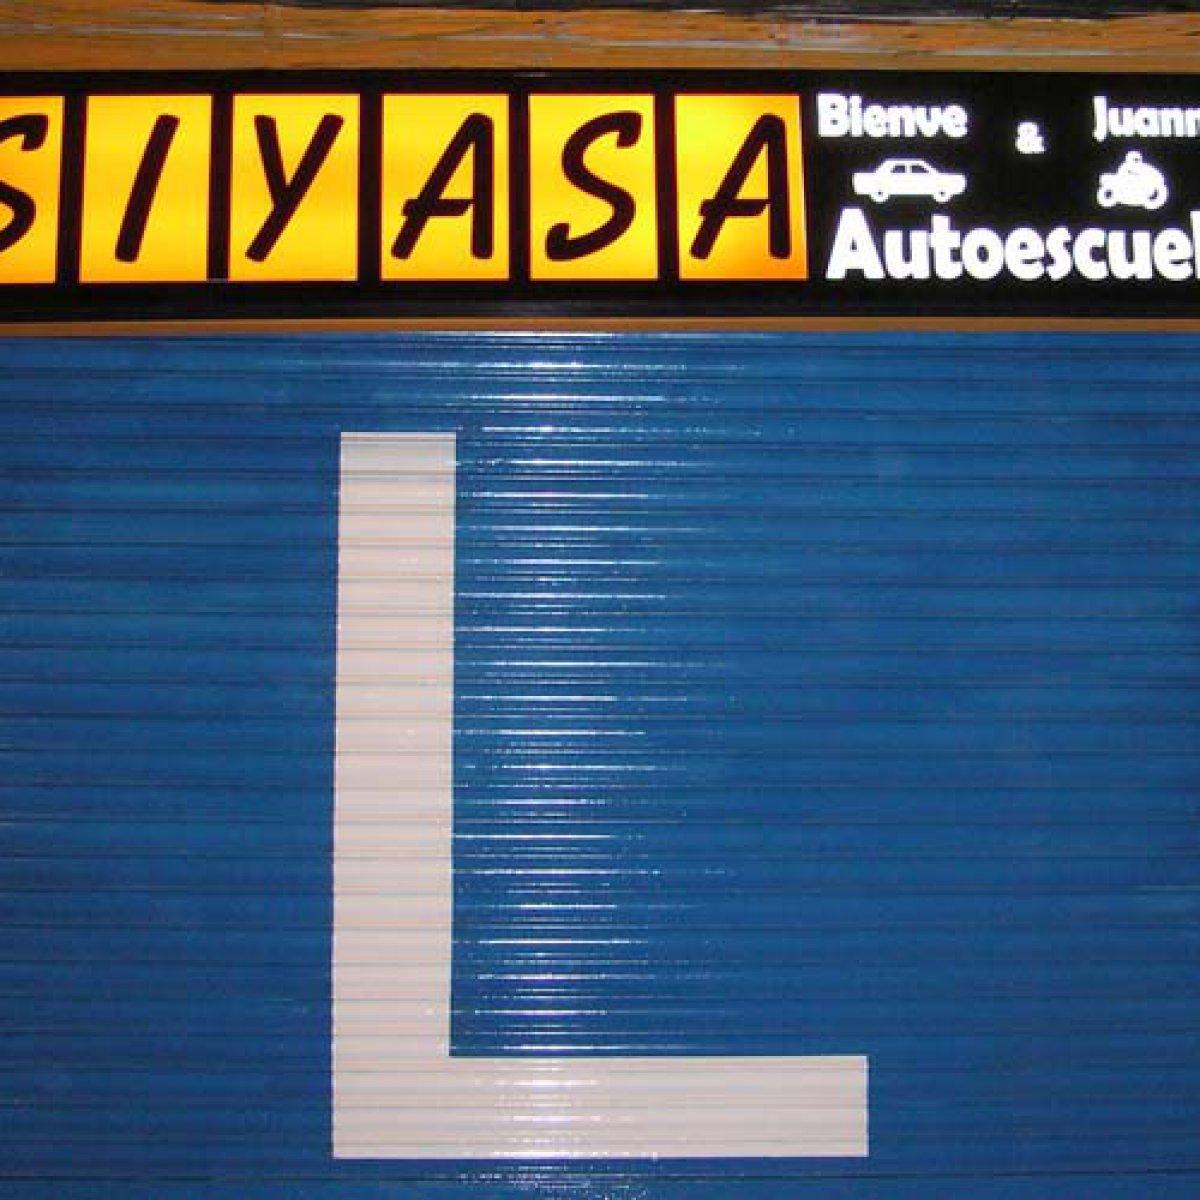 Autoescuela Siyasa